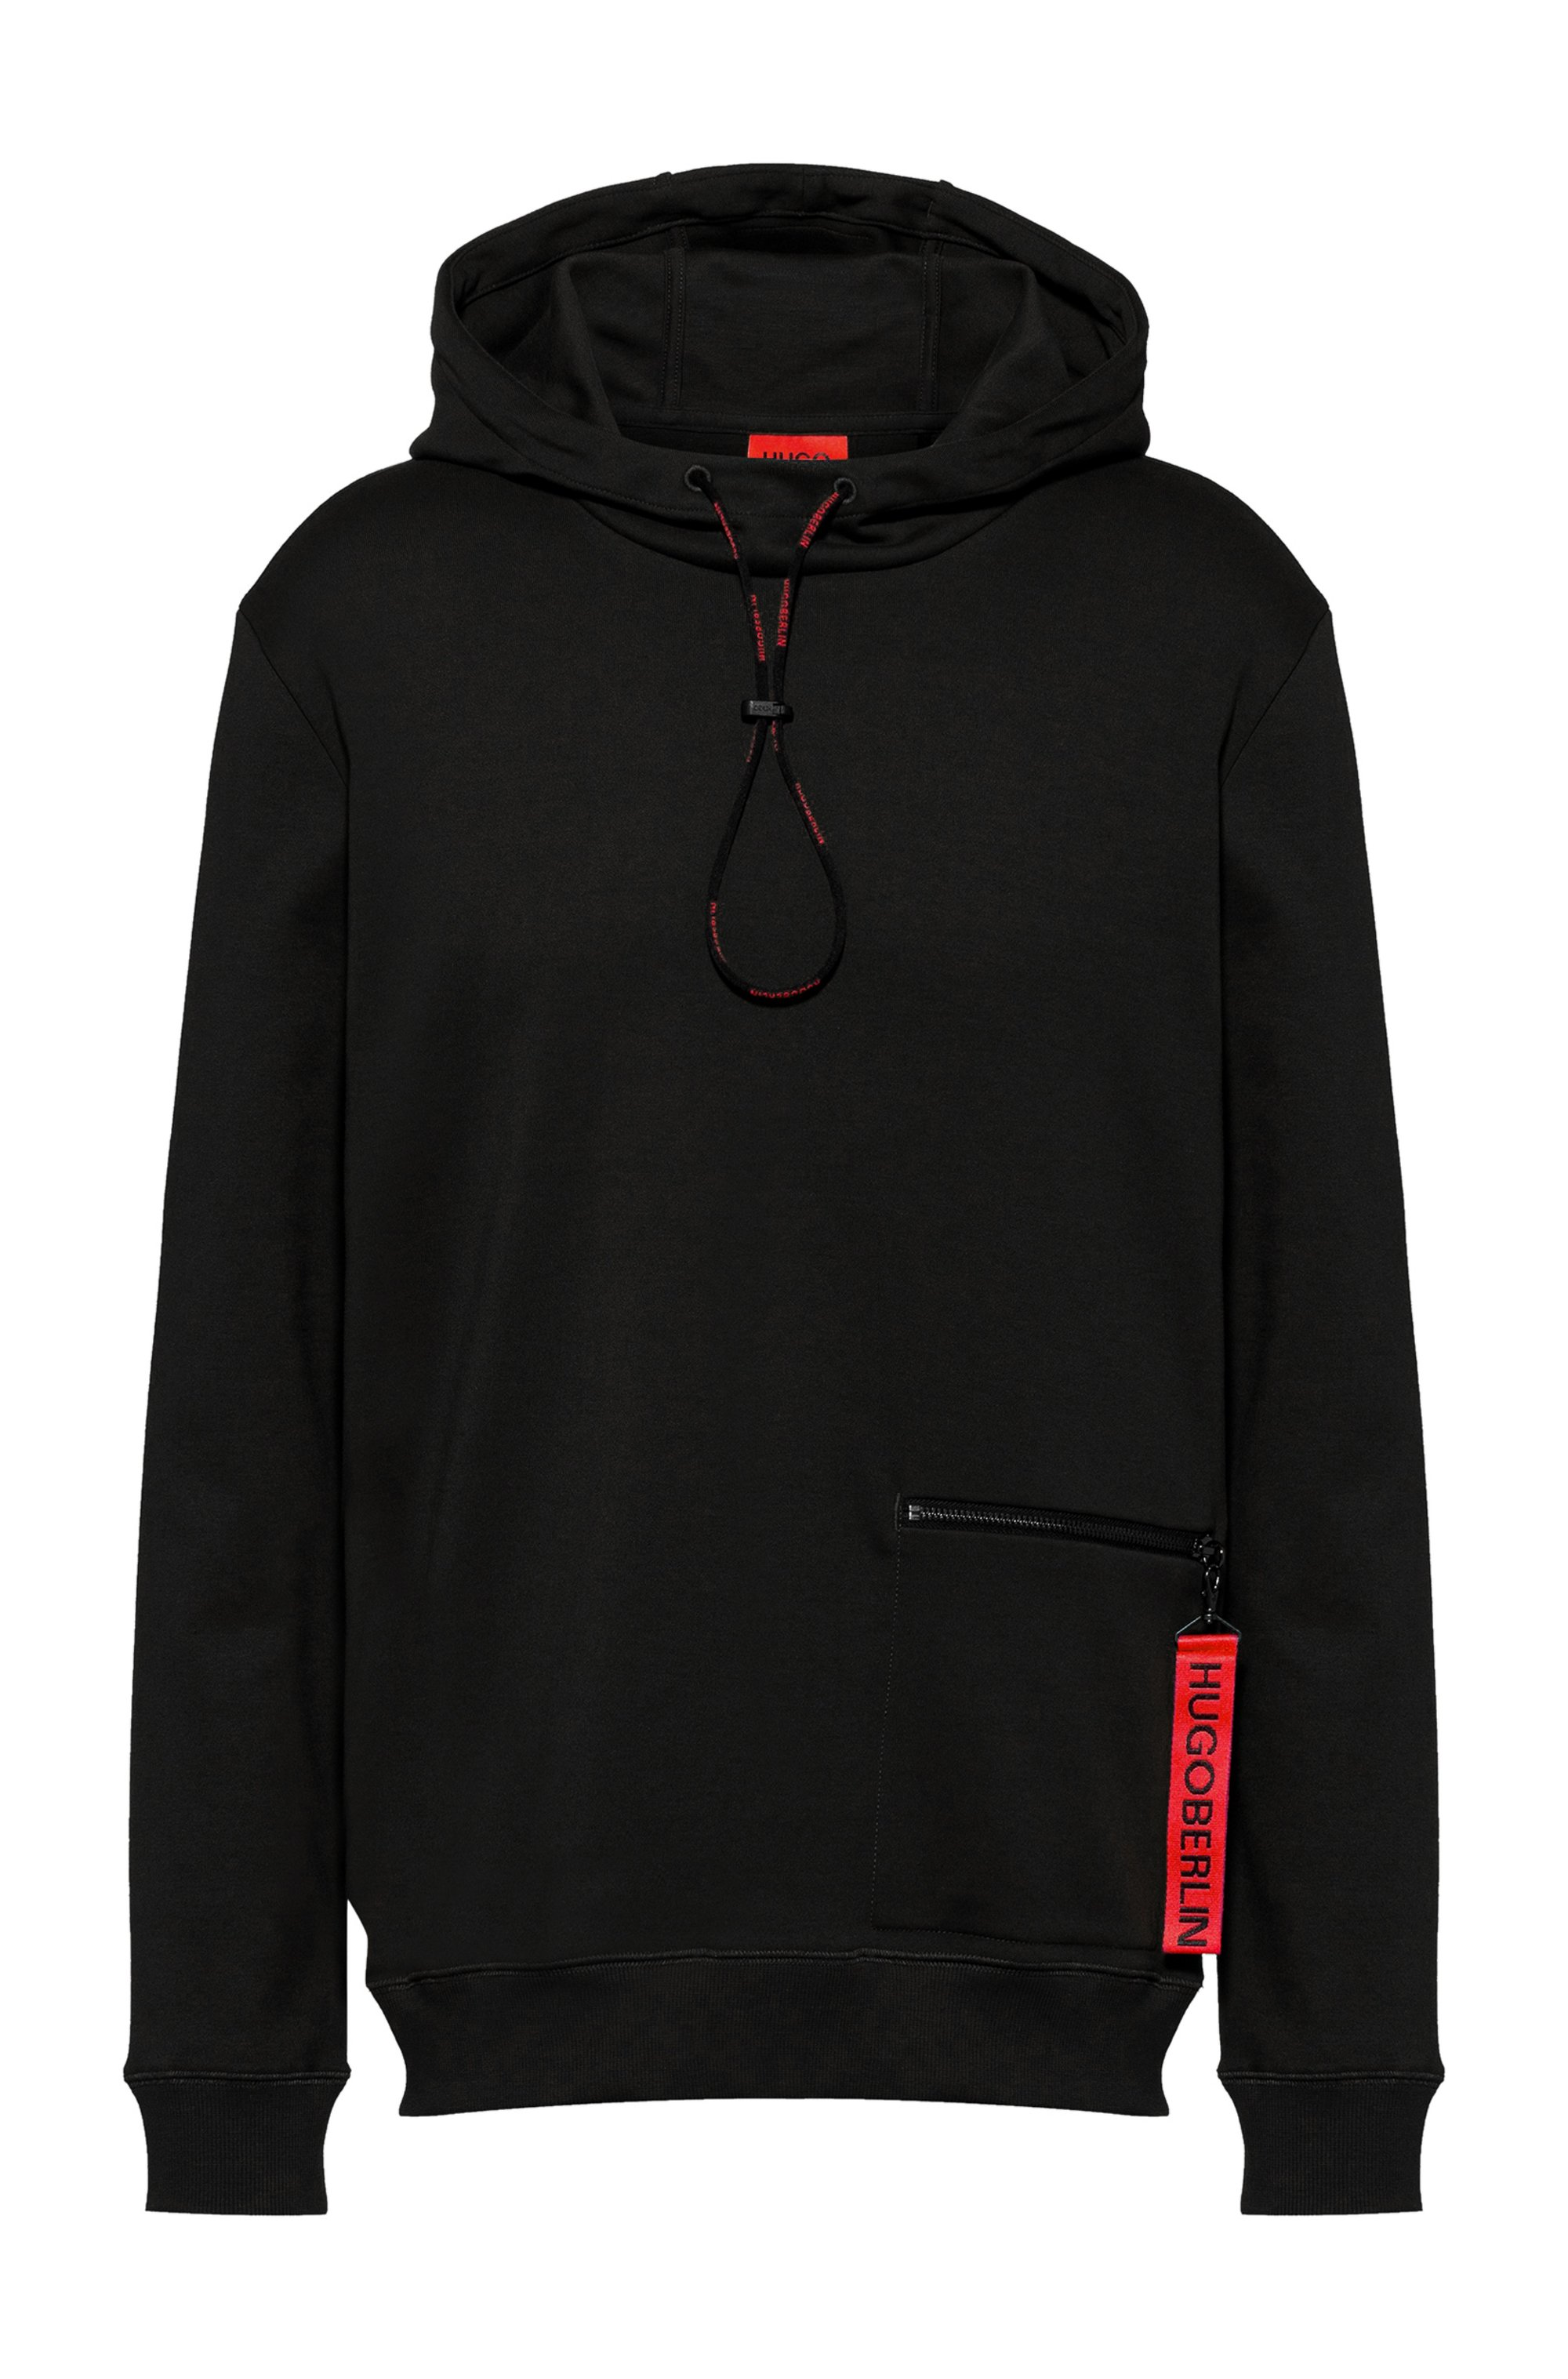 Interlock-cotton hooded sweatshirt with zipped pocket, Black